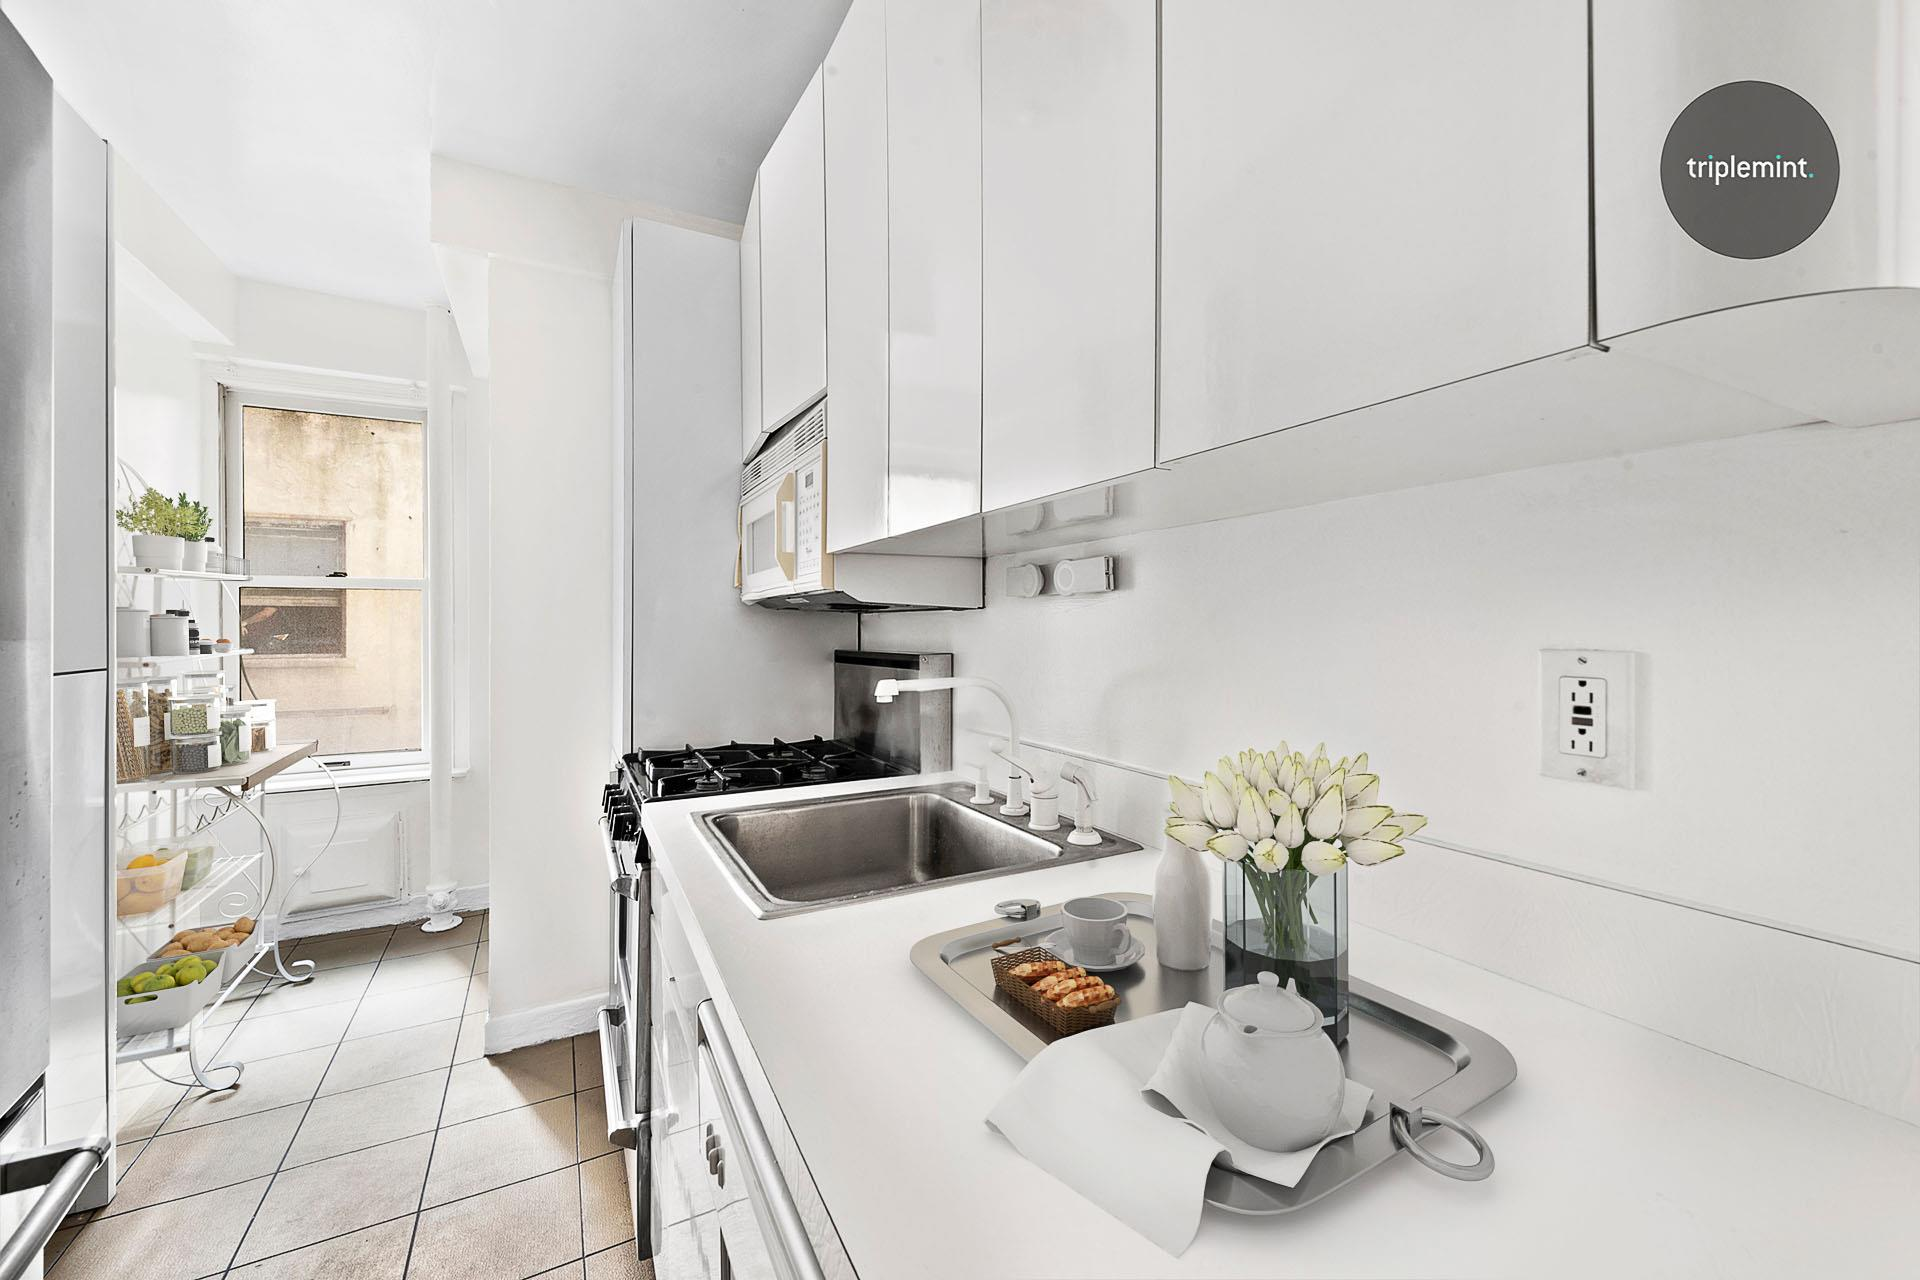 111 East 88th Street Carnegie Hill New York NY 10128